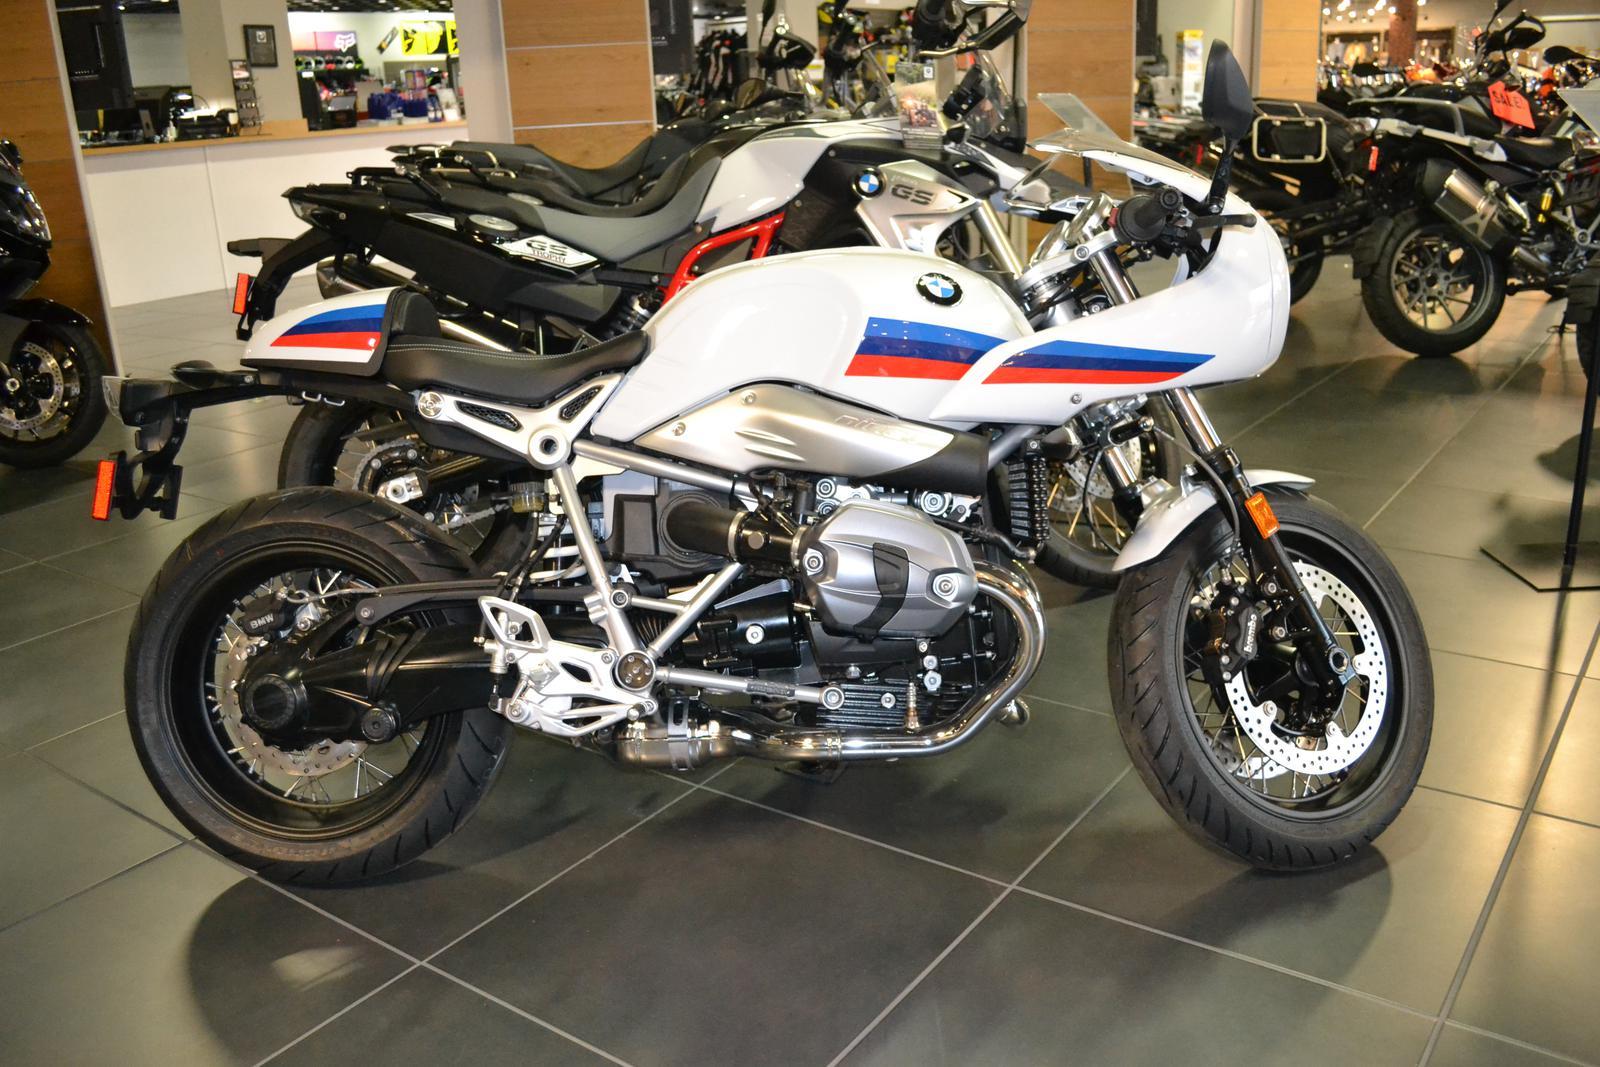 2017 BMW R nine T Racer for sale in Vancouver, WA. BMW Motorcycles Bmw R Nine T Racer on bmw rr1000, bmw r100, bmw superbike, review bmw nine t, bmw motorcycles, bmw s1000rr black, bmw roadster, bmw s1000rr engine, bmw r1200c 1998, bmw r26, bmw s1000f, bmw r1150r, bmw r25, bmw r1200gt, bmw gs 1200, bmw f 800, bmw motorrad, bmw r1200c custom, bmw r12, bmw r1150gs,